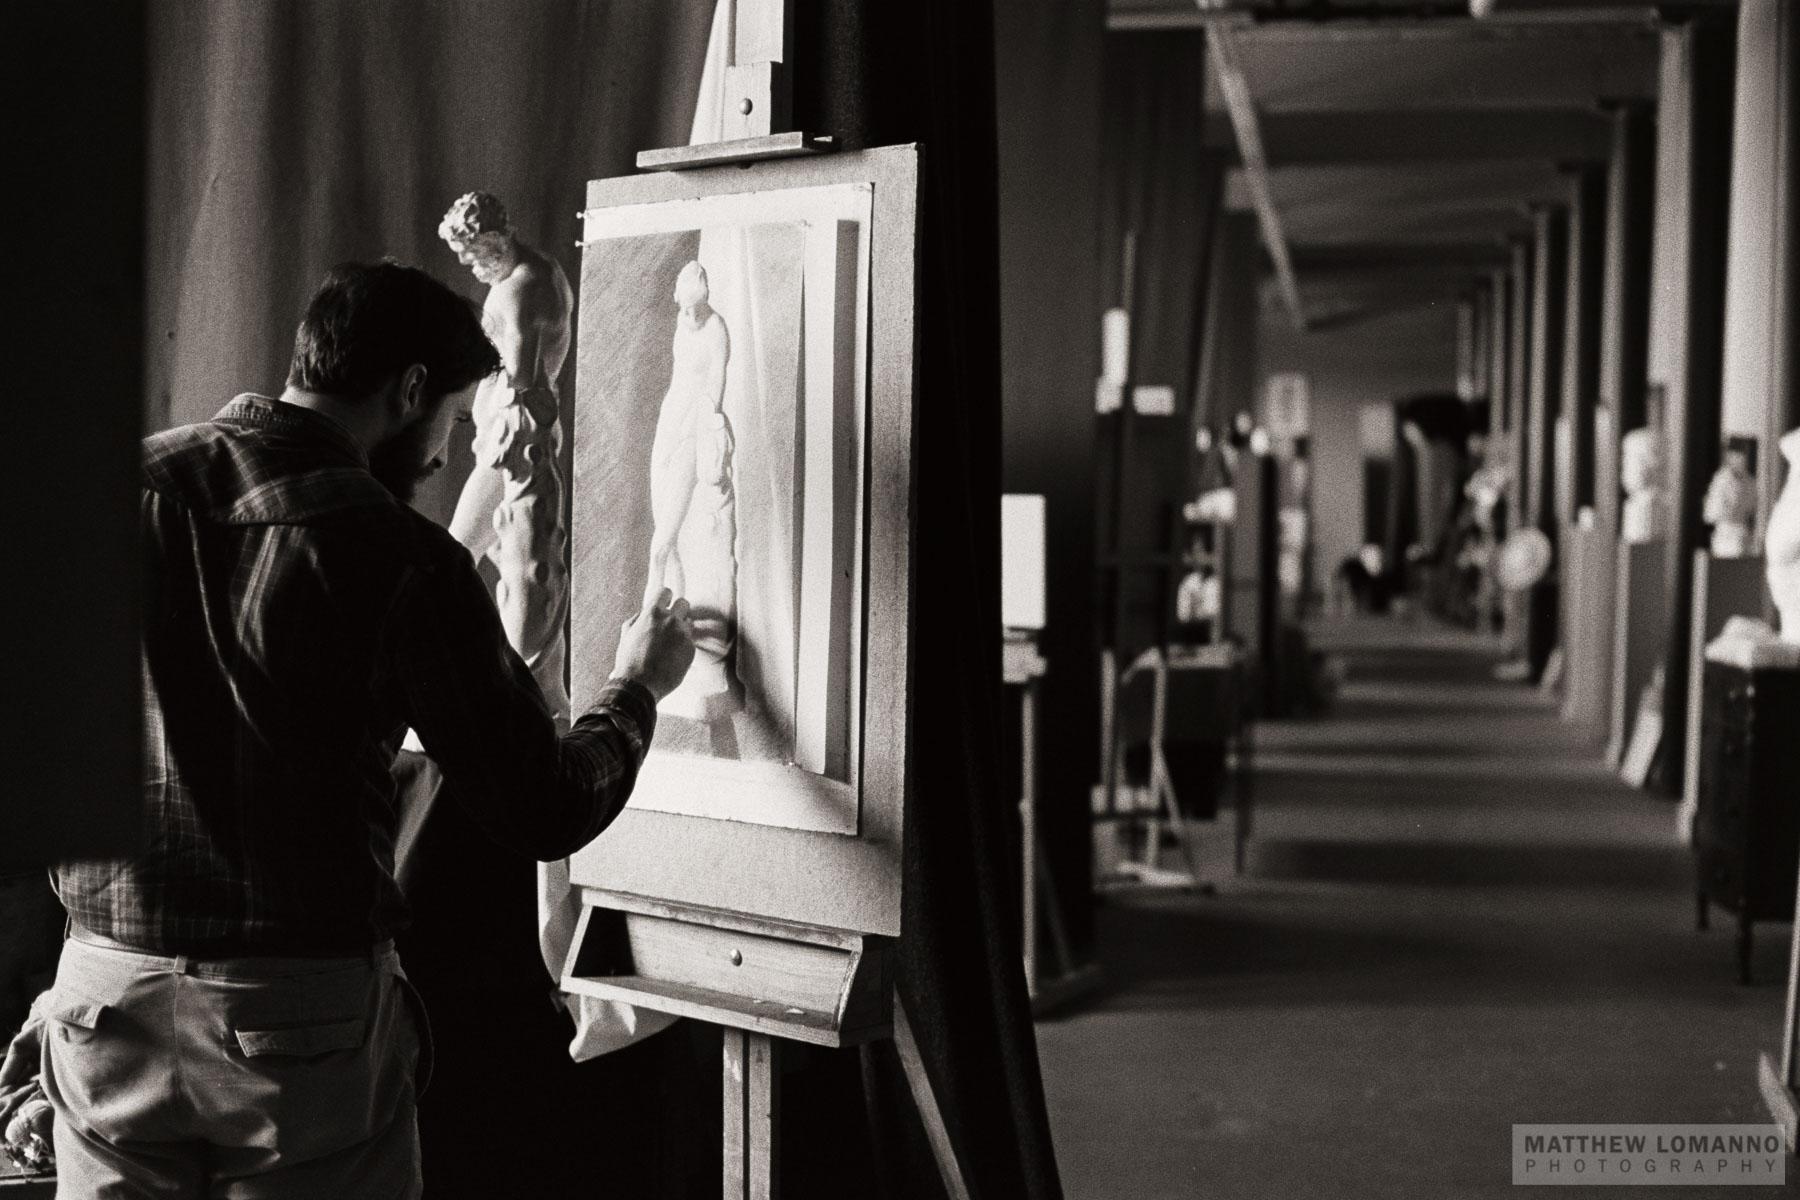 Ingbretson_atelier_working_by_Lomanno-13.jpg